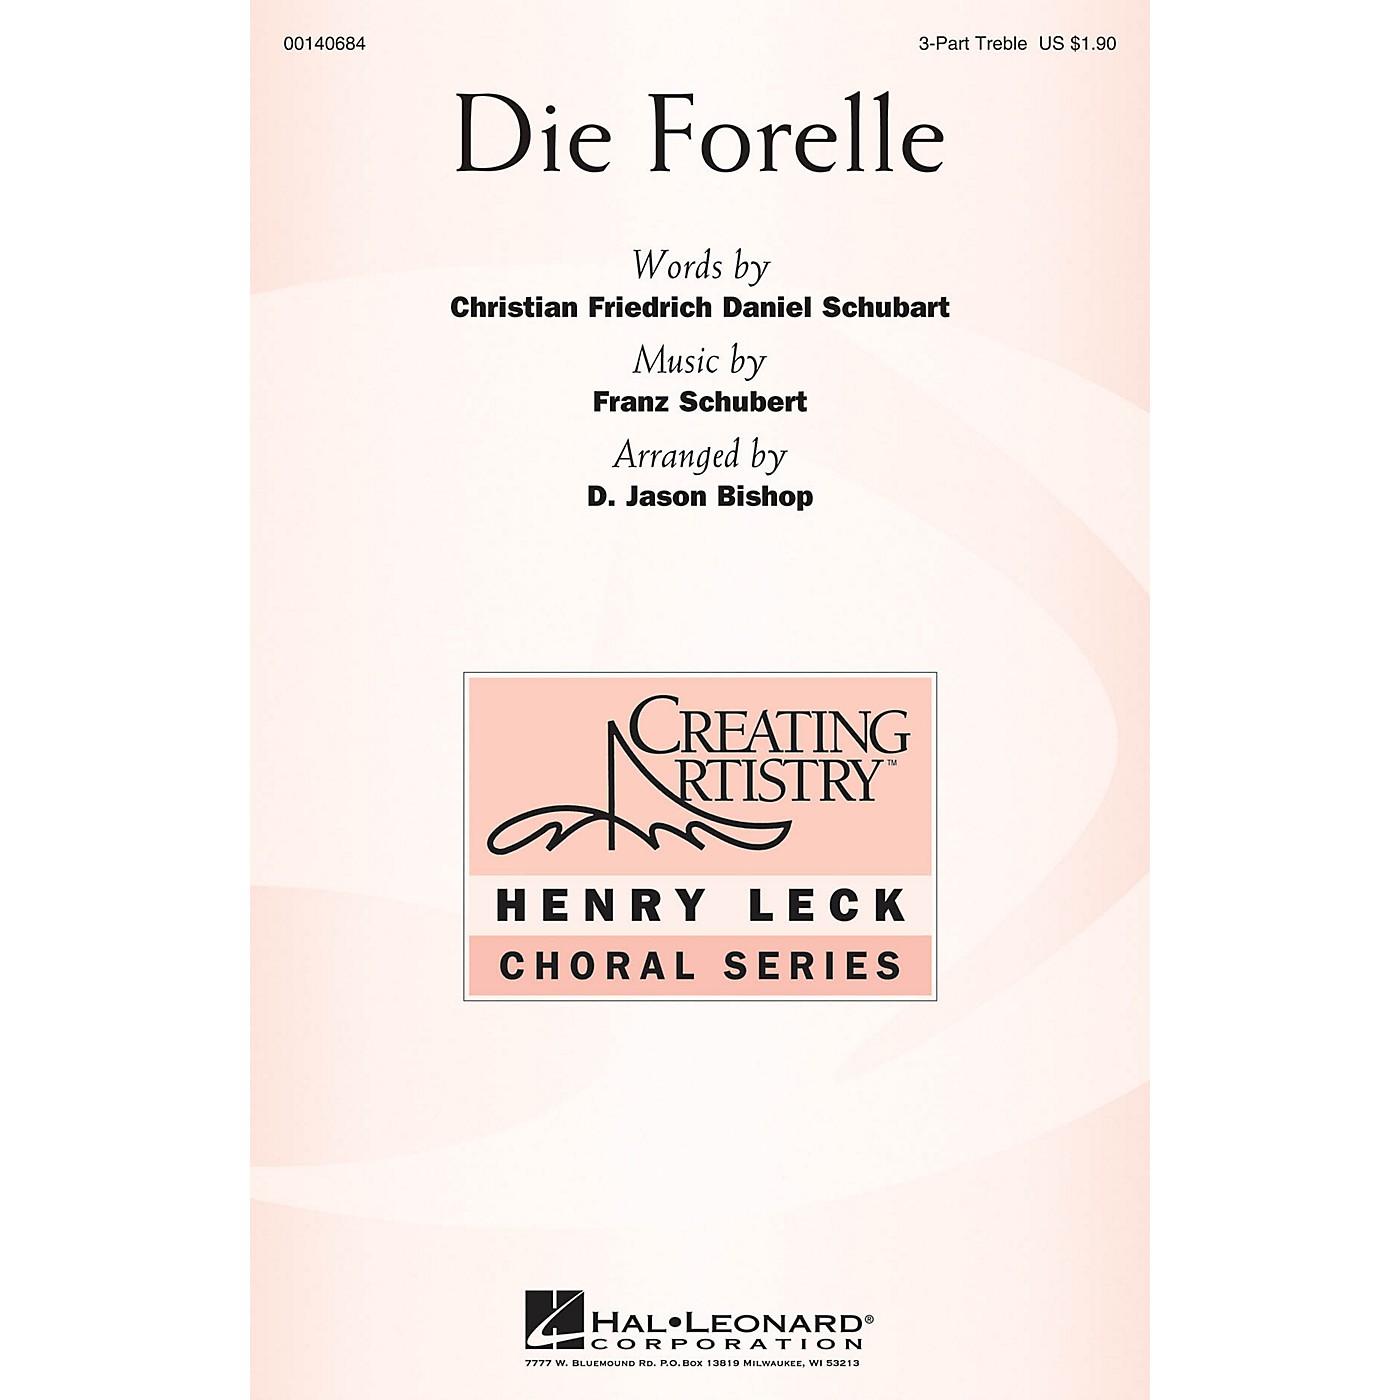 Hal Leonard Die Forelle 3 Part Treble arranged by D. Jason Bishop thumbnail